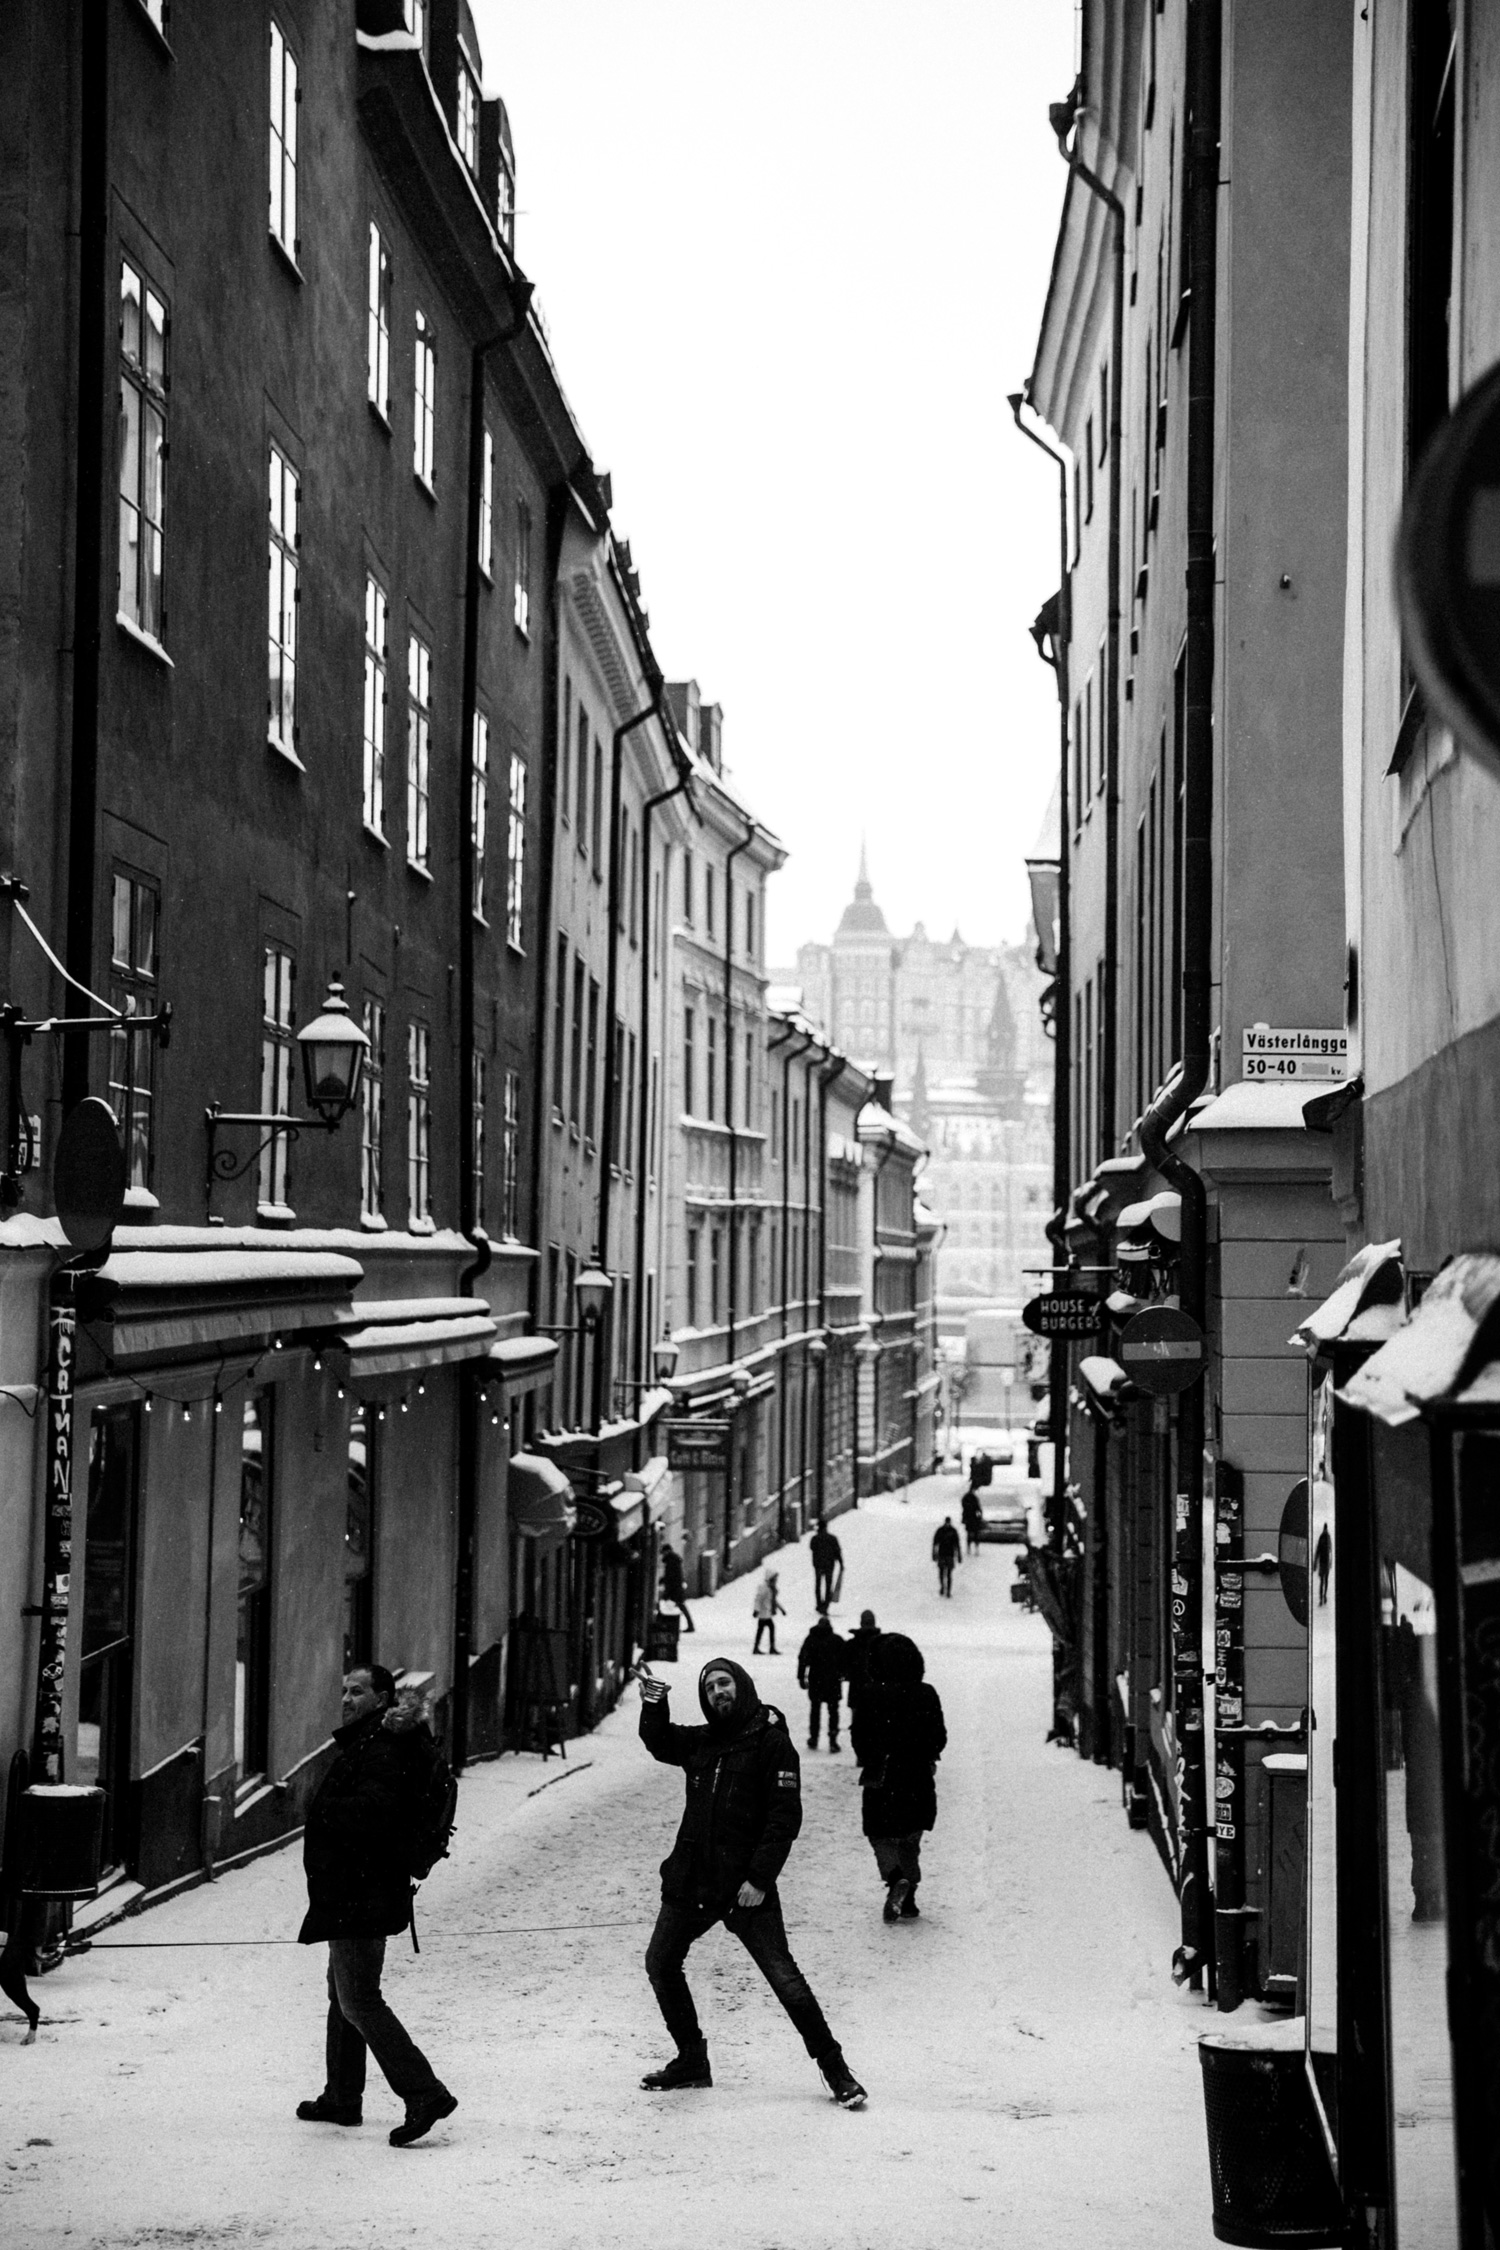 079-gamla-stan-old-town.jpg